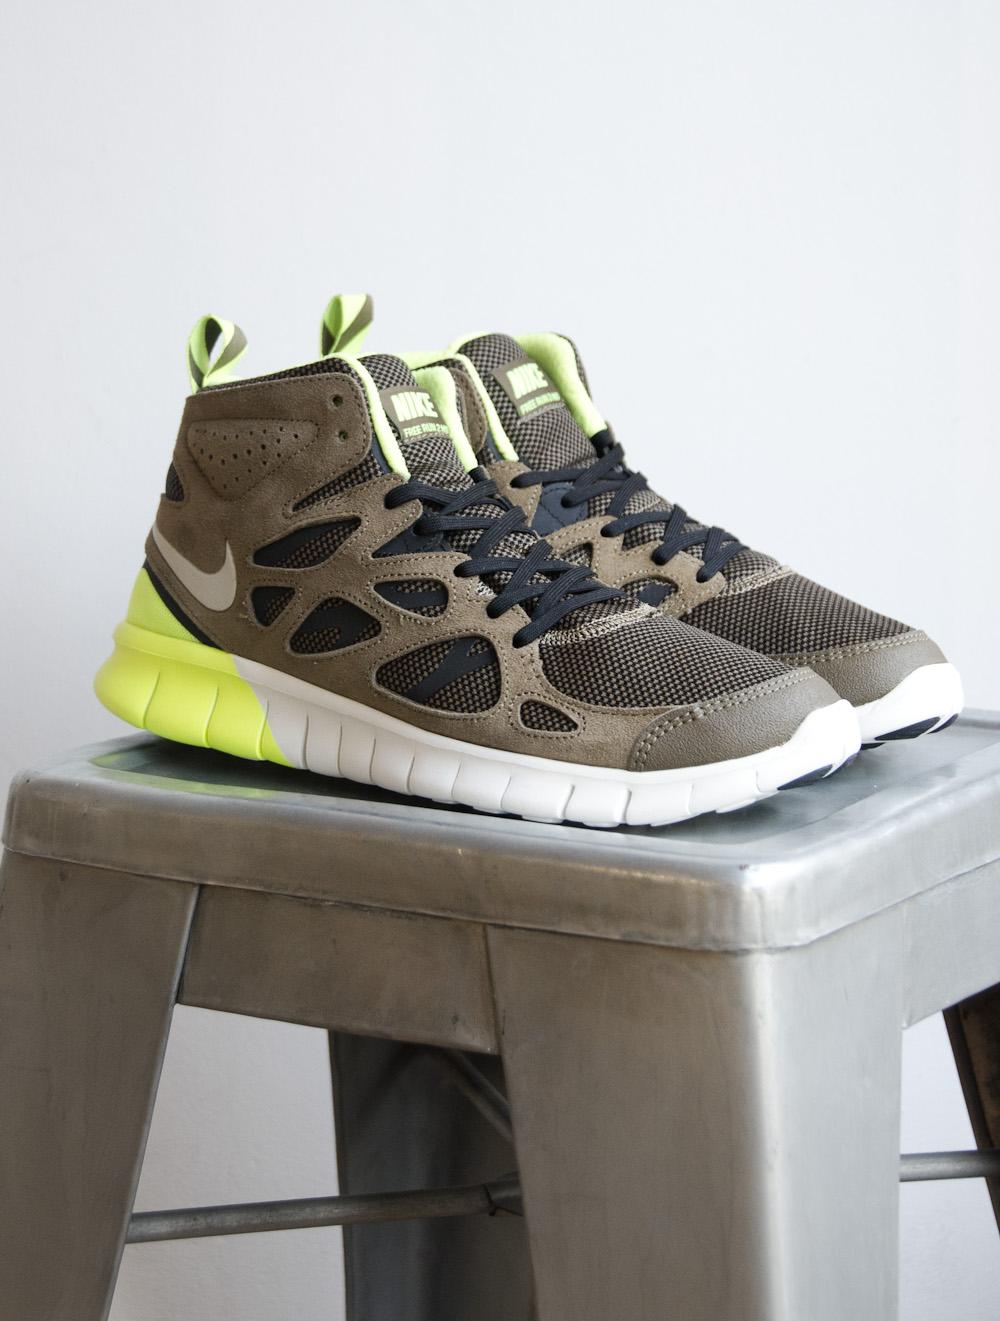 sneakerboot-premium-picks-5.jpg